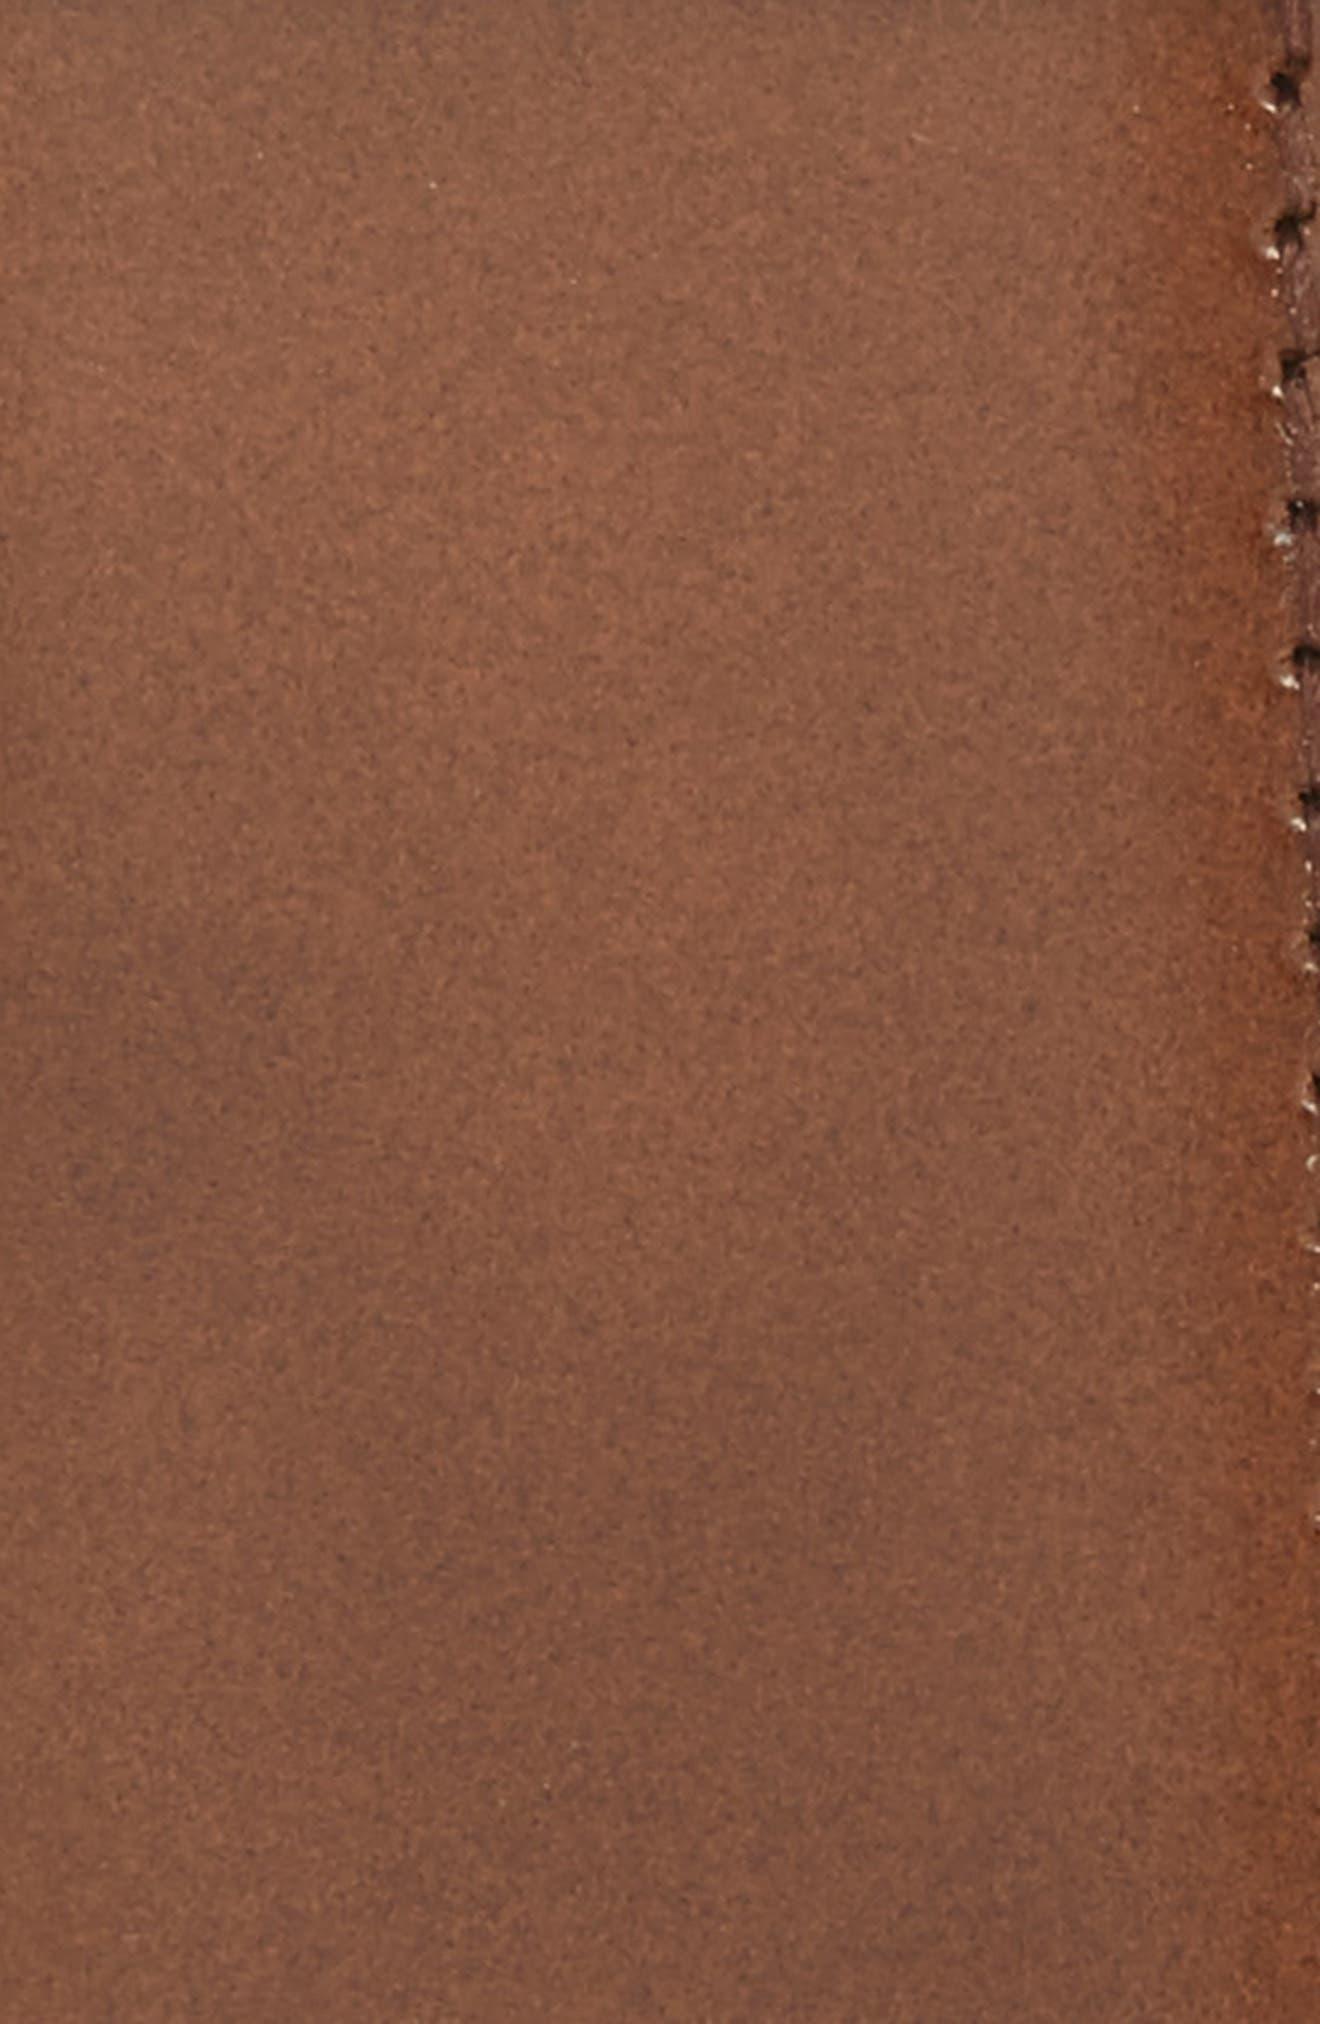 Reversible Leather Belt,                             Alternate thumbnail 3, color,                             MADERA/ BLACK